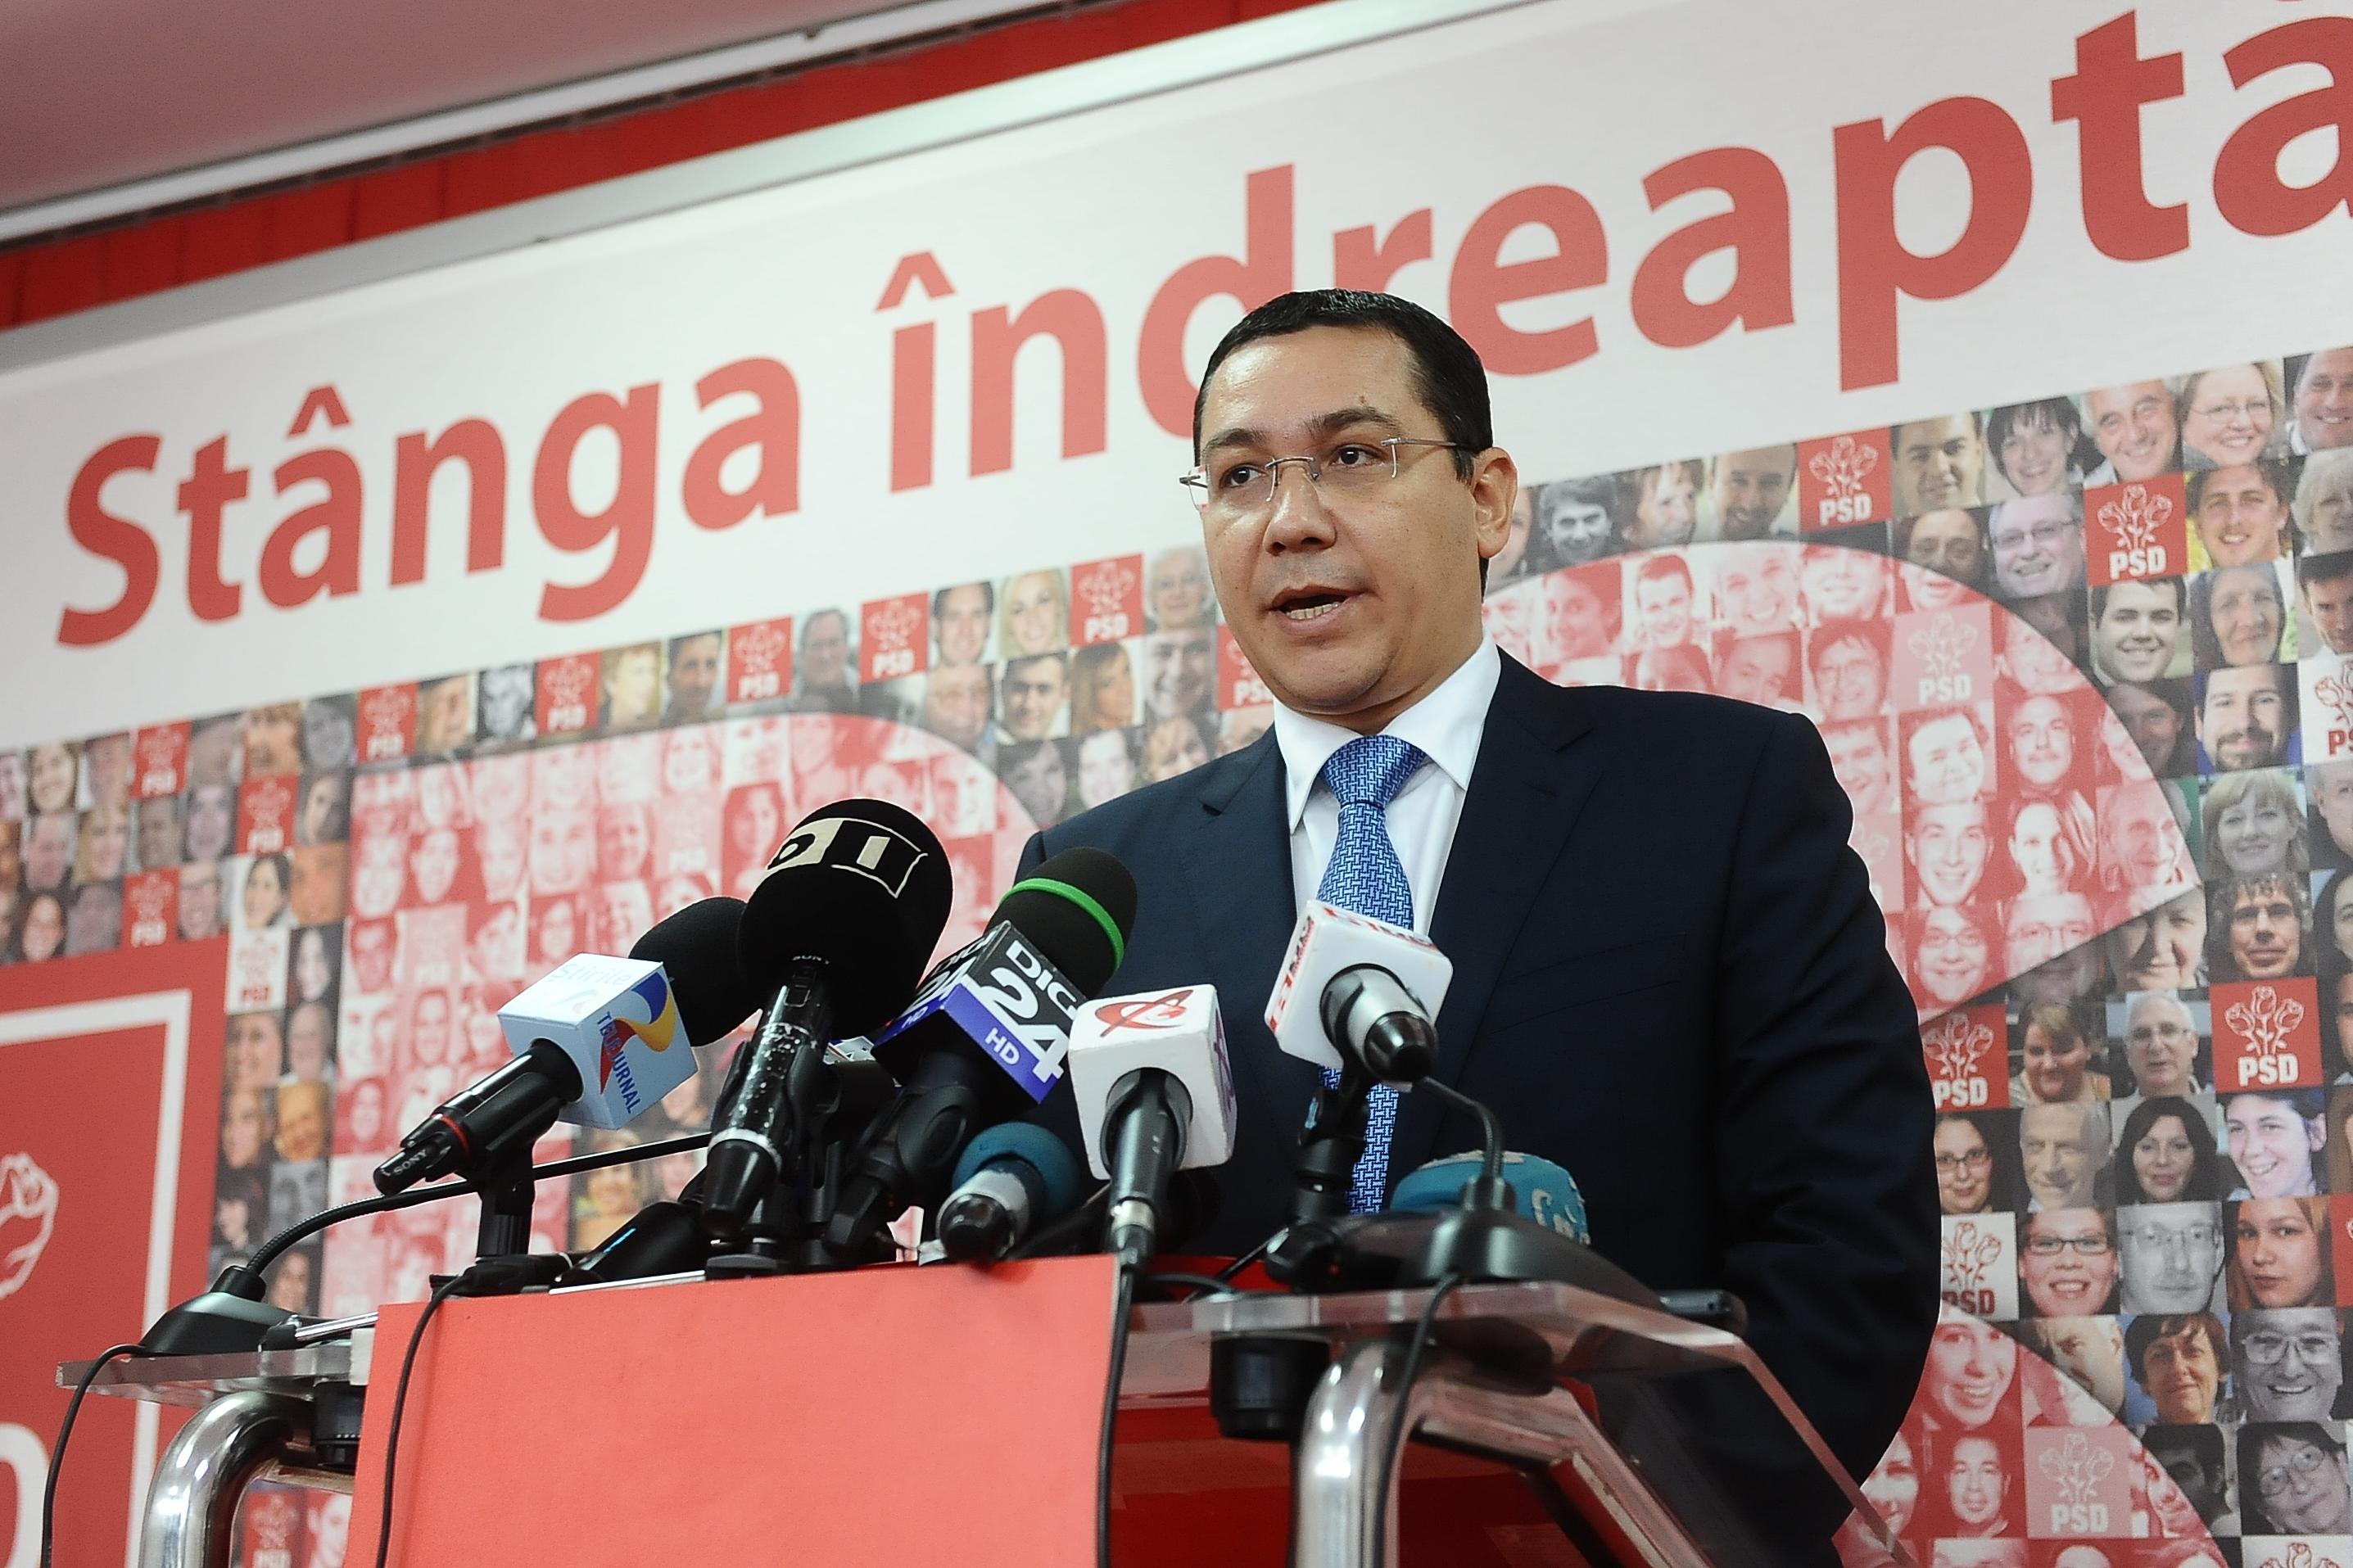 """Tehnocratul"" Ponta si pomenile electorale"